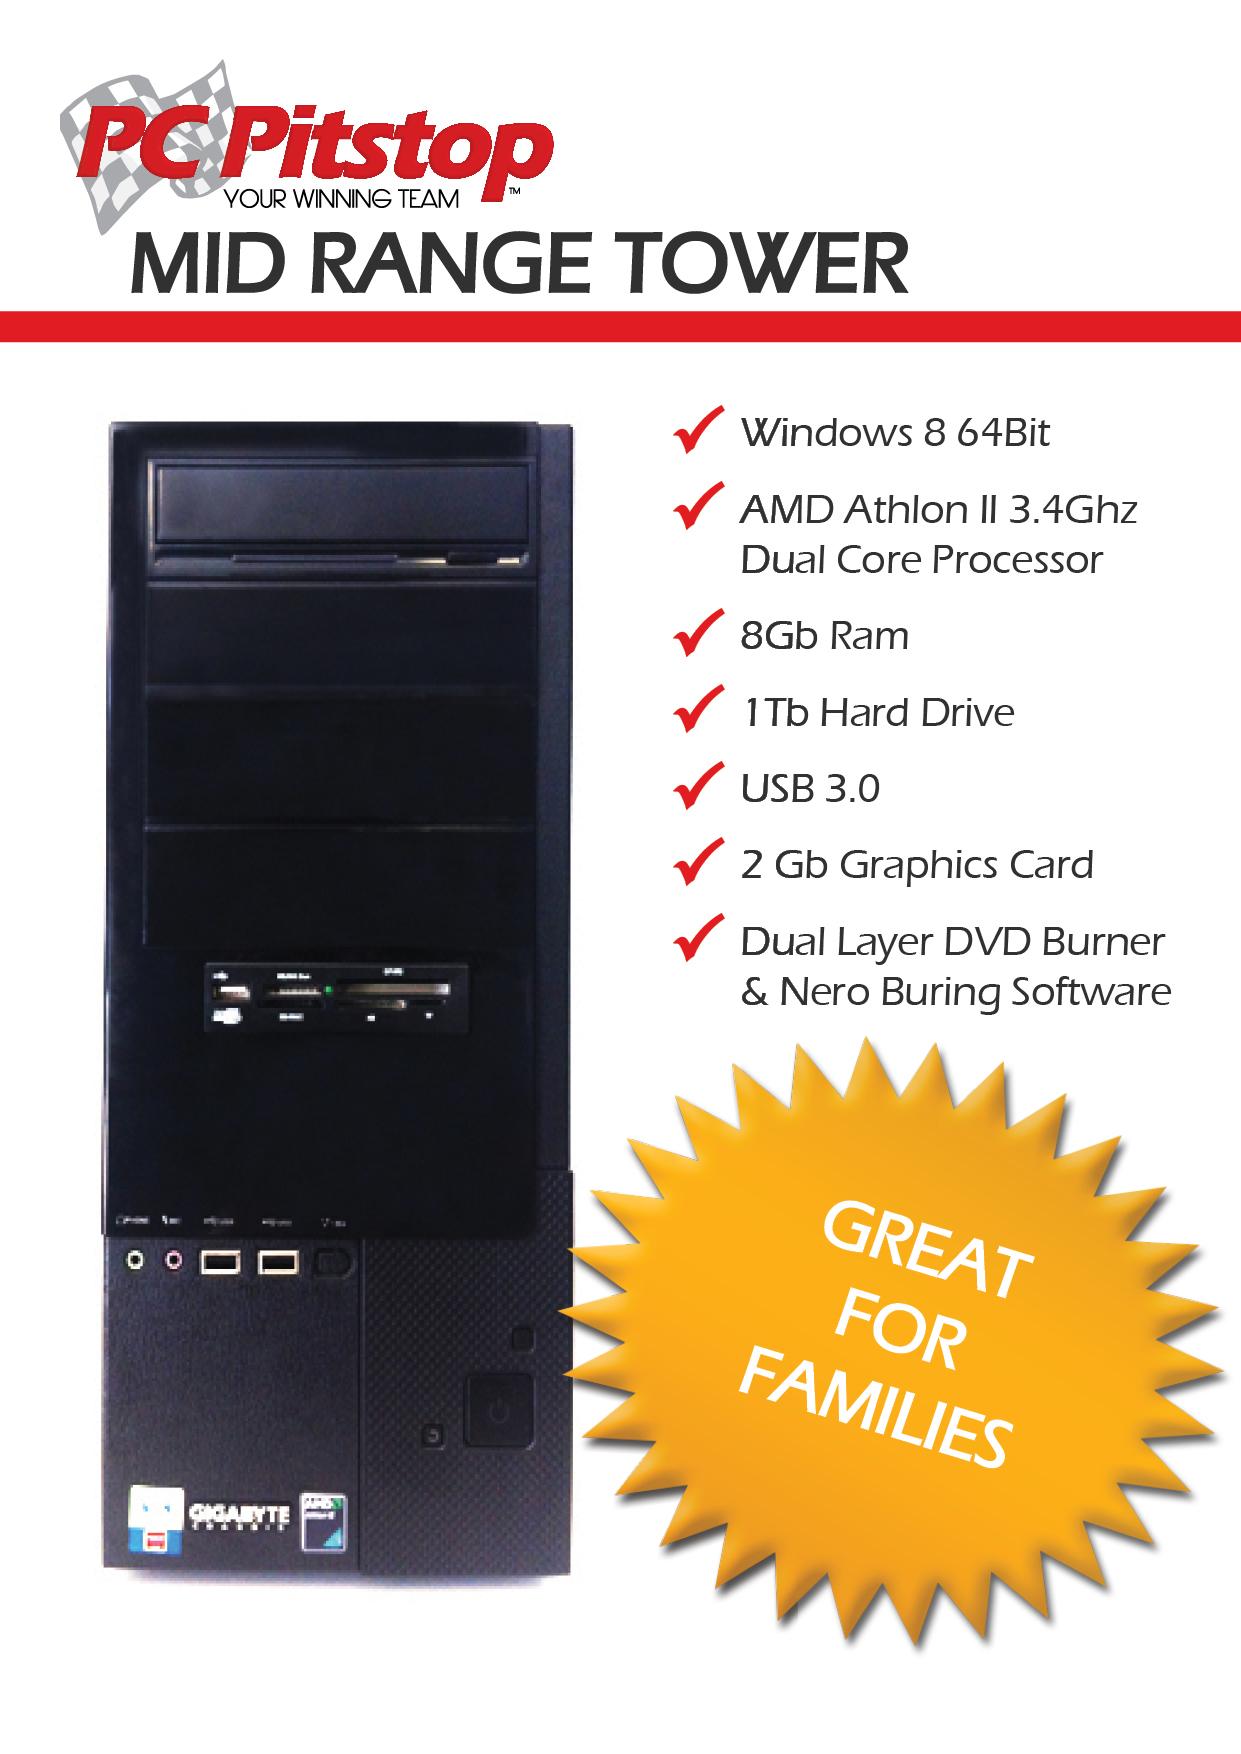 PC Pitstop Inhouse Specials Mid Range Tower